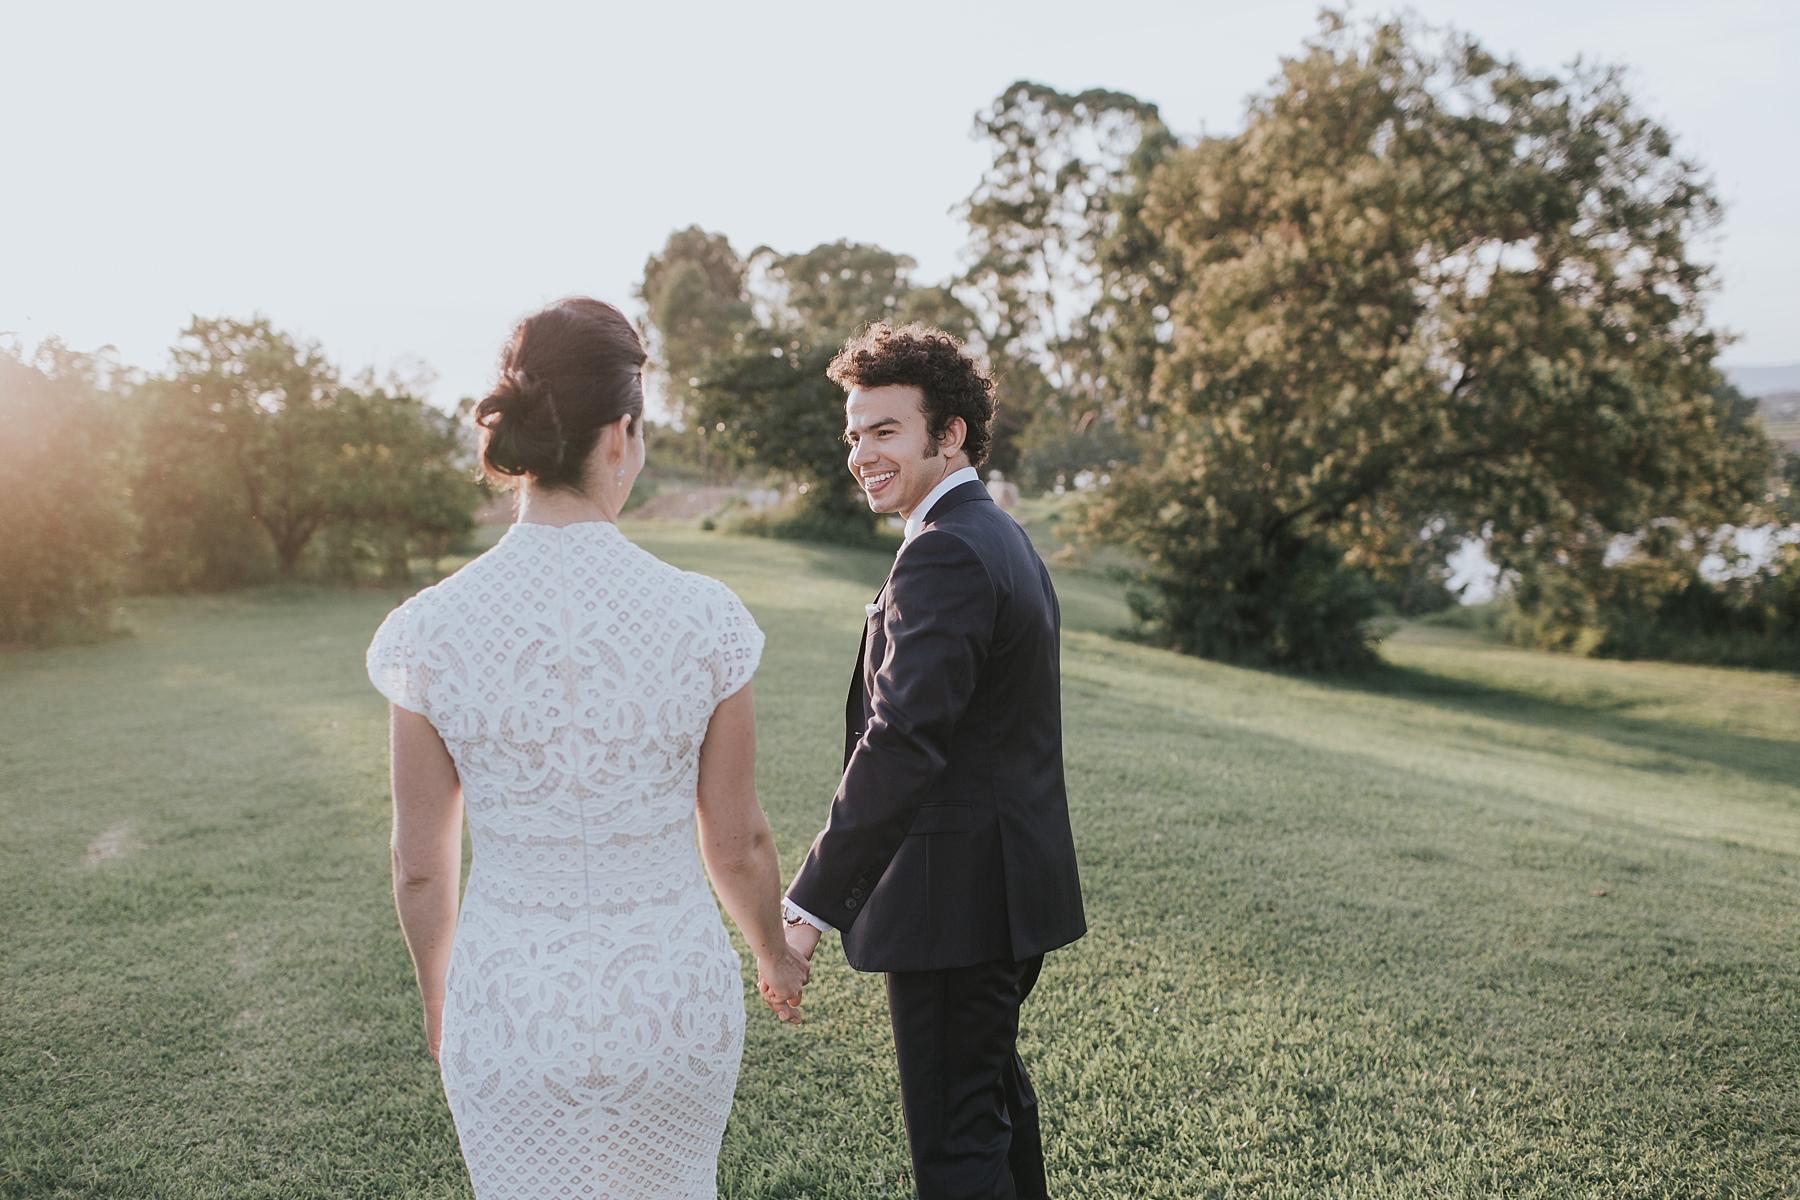 creative wedding photography by jonathan david